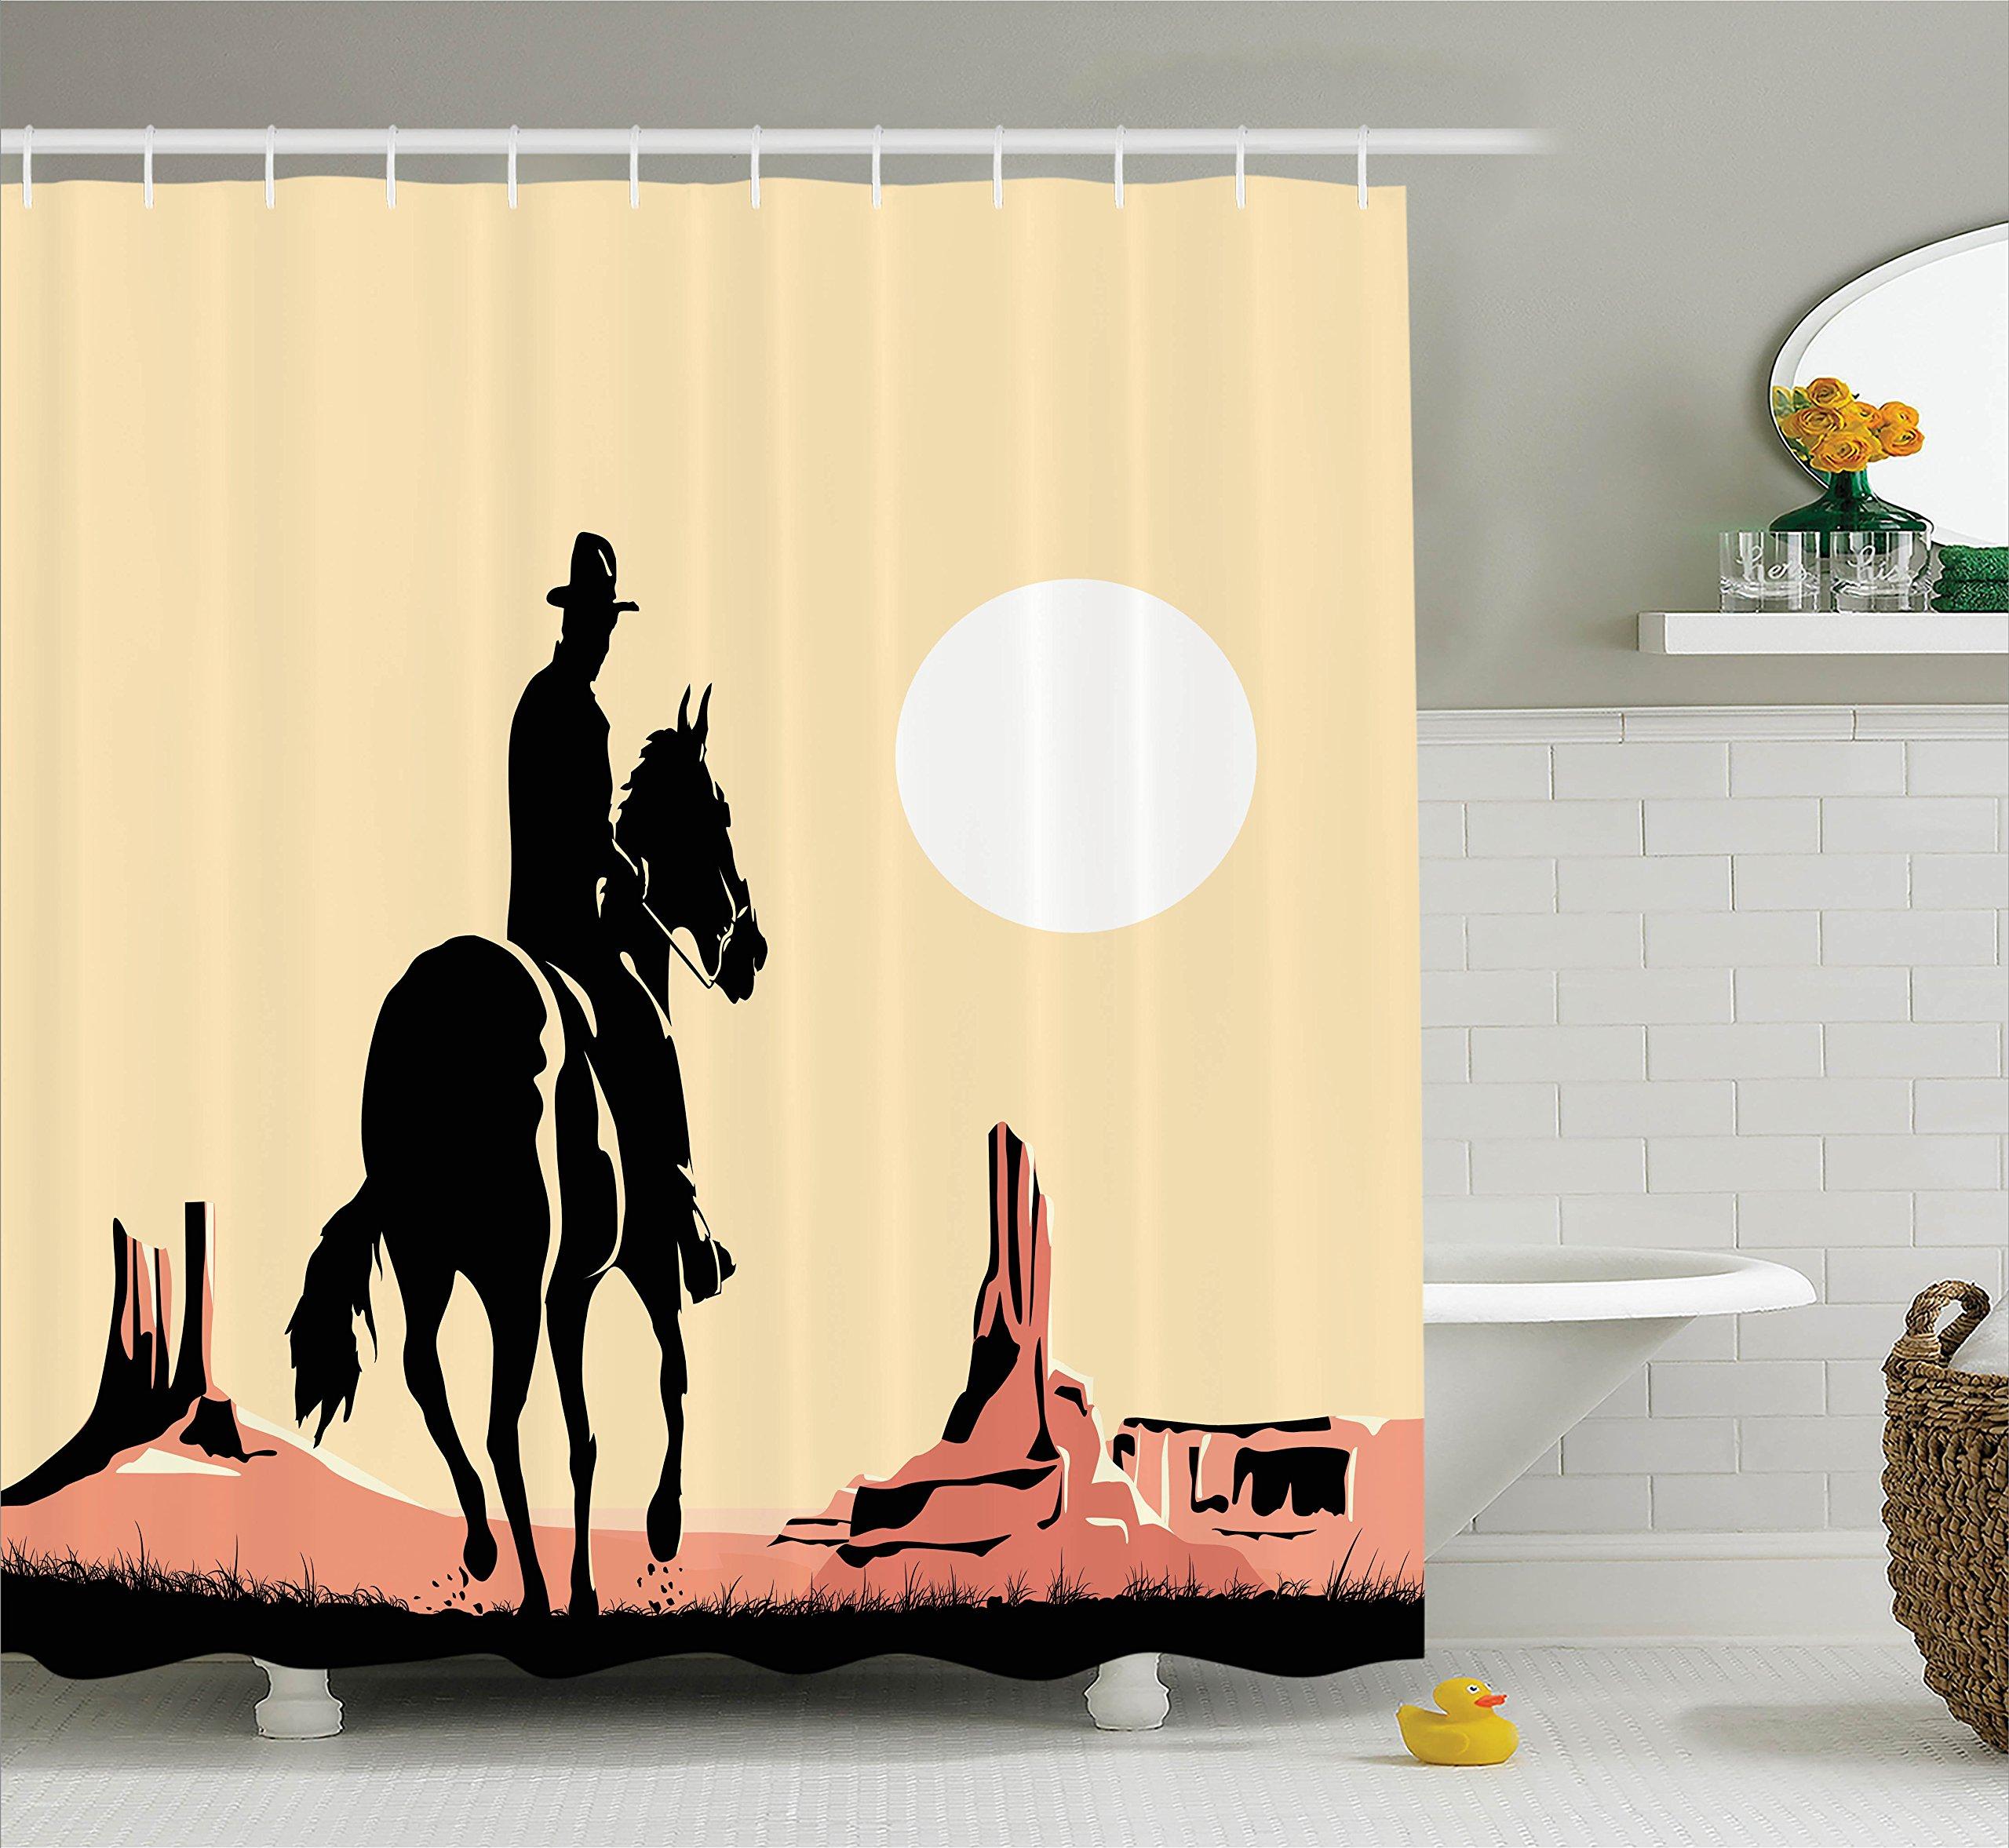 Cowboy and Western Art Decor: Amazon.com